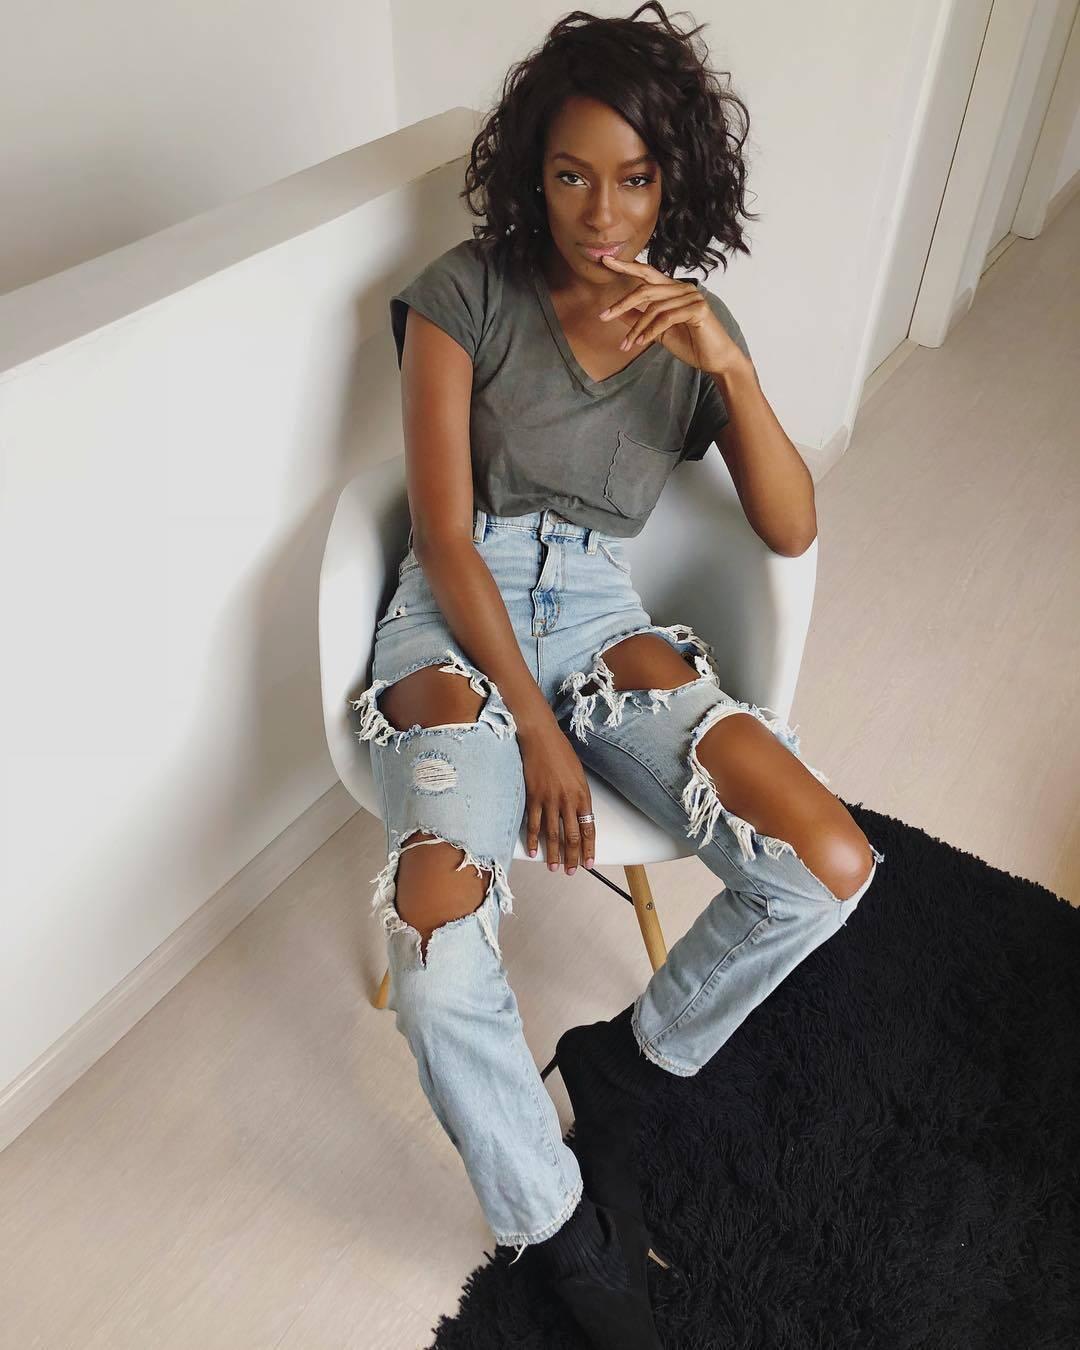 A famosa ama a versatilidade das peças jeans (Foto: Instagram/ @pathydejesus)